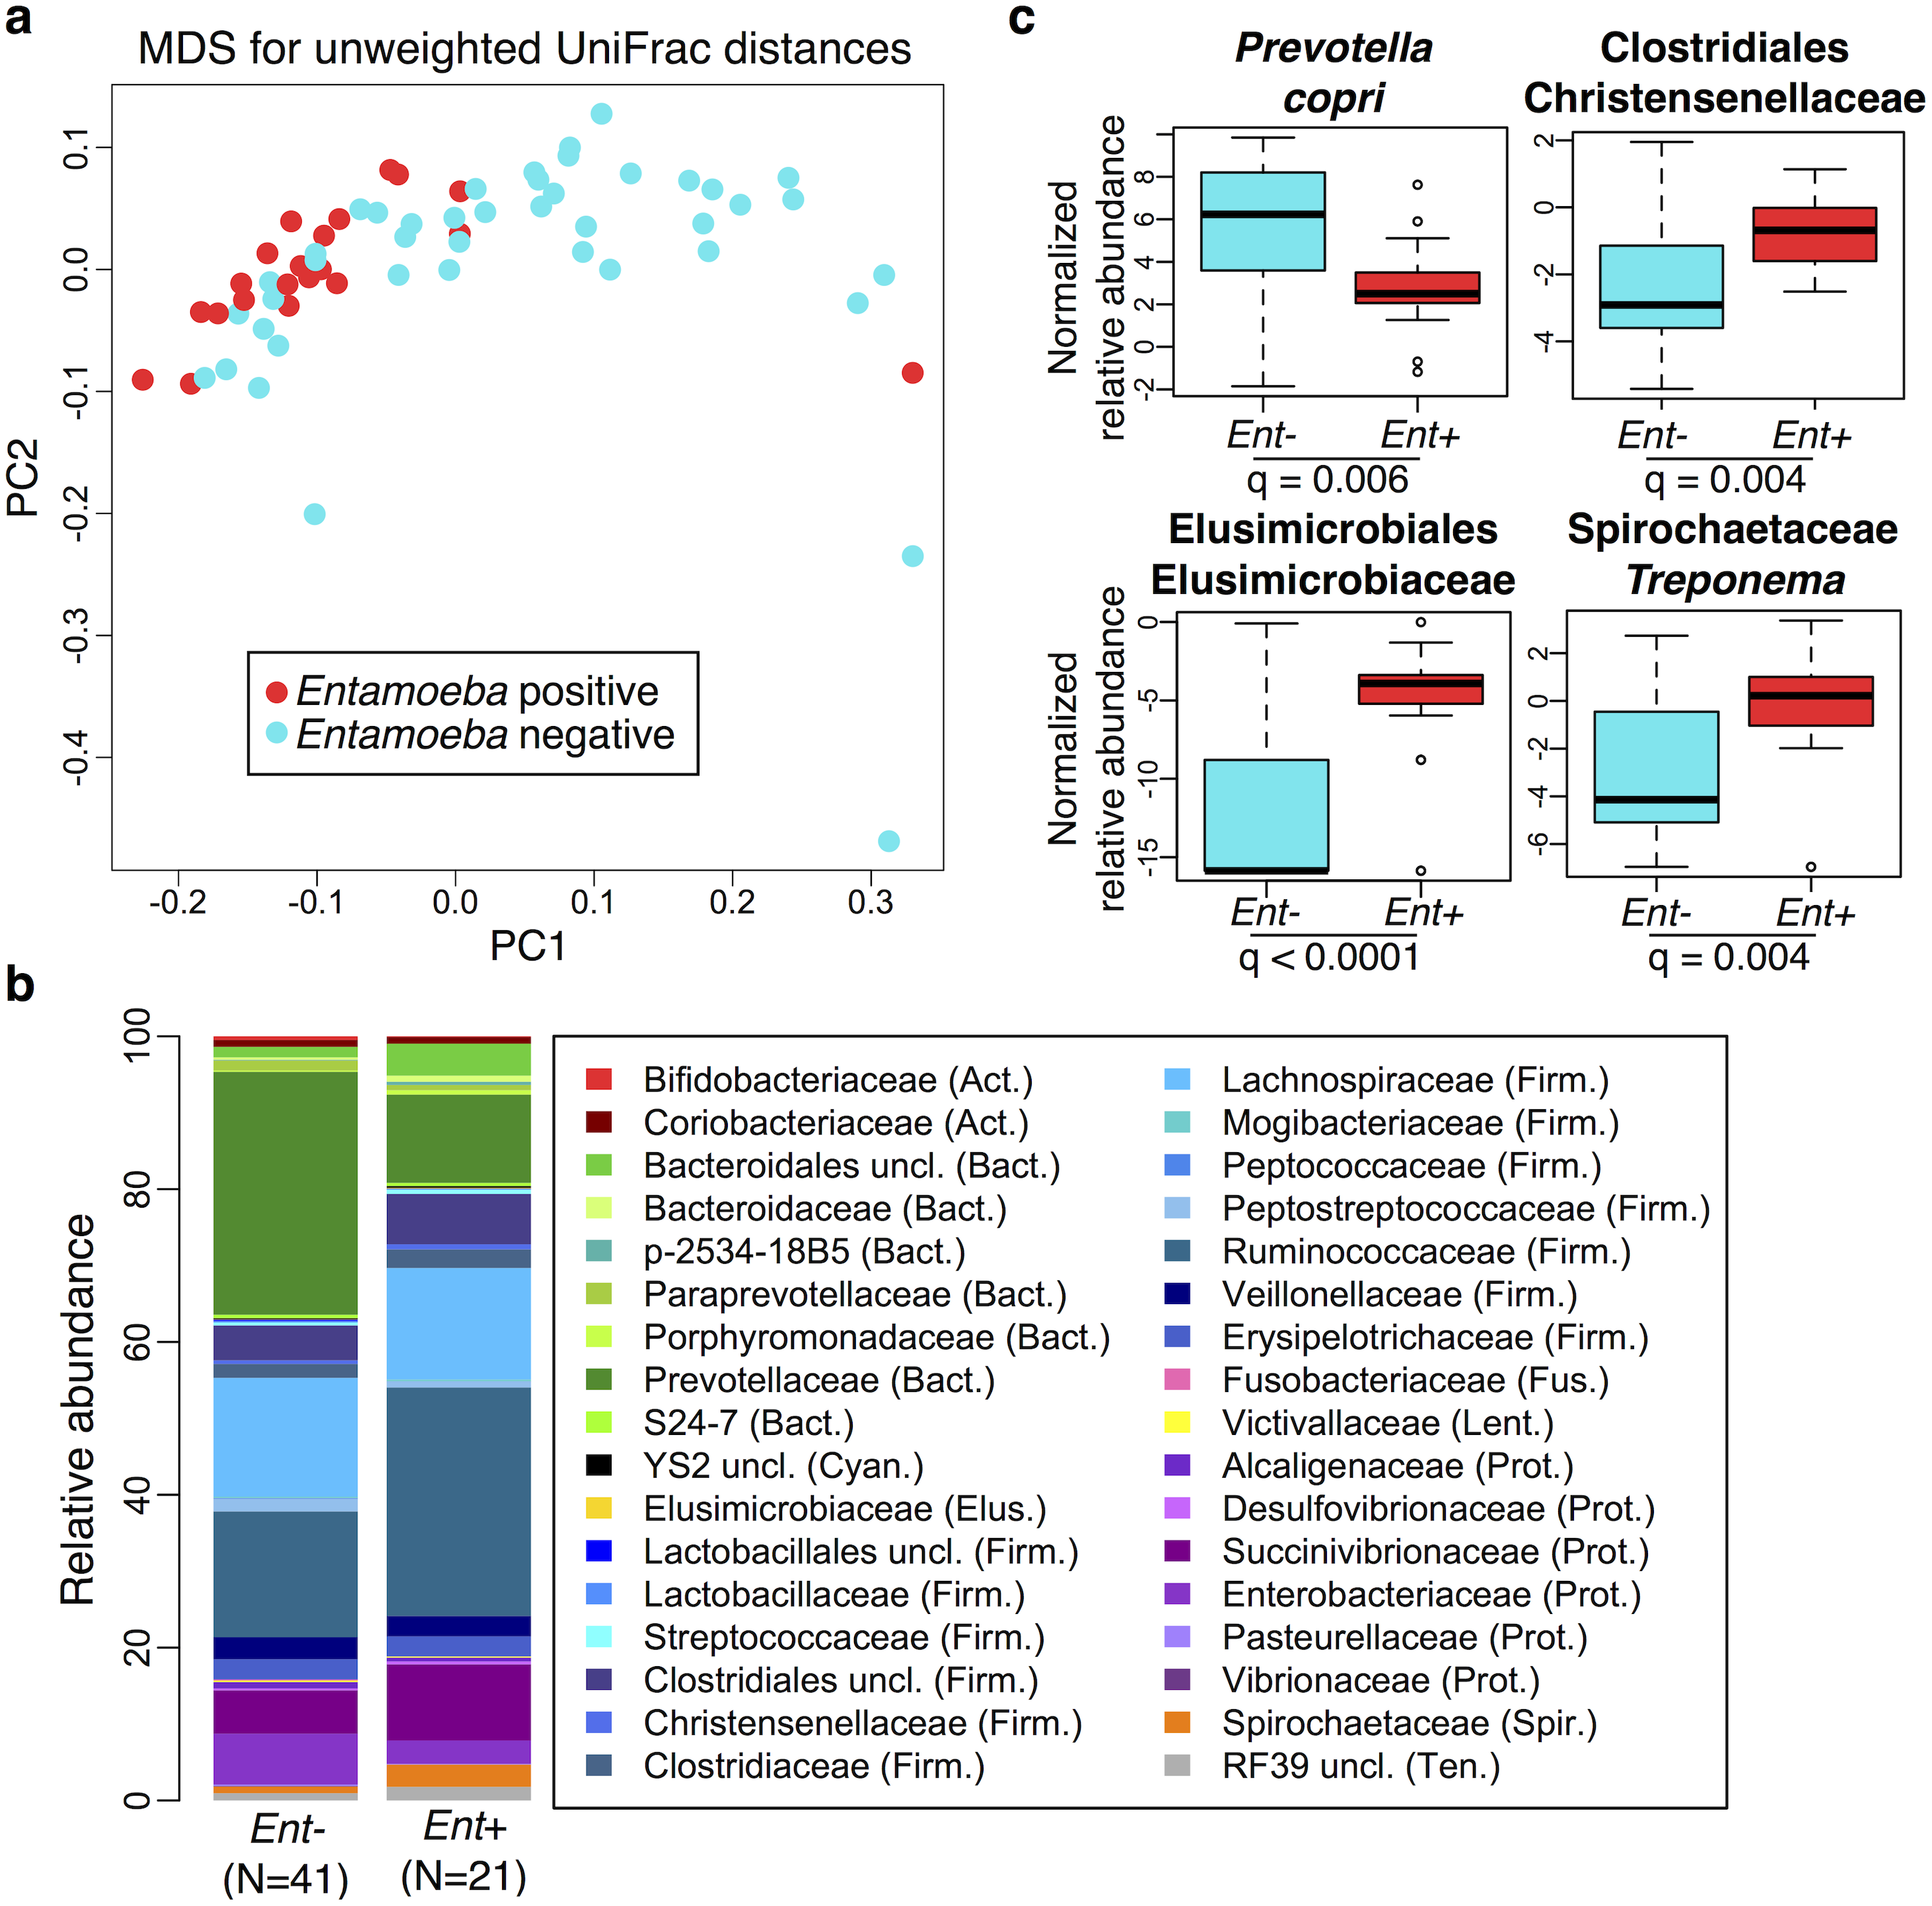 Relationship between the presence of <i>Entamoeba</i> (<i>Ent</i>- or <i>Ent</i>+) and fecal microbiome composition.